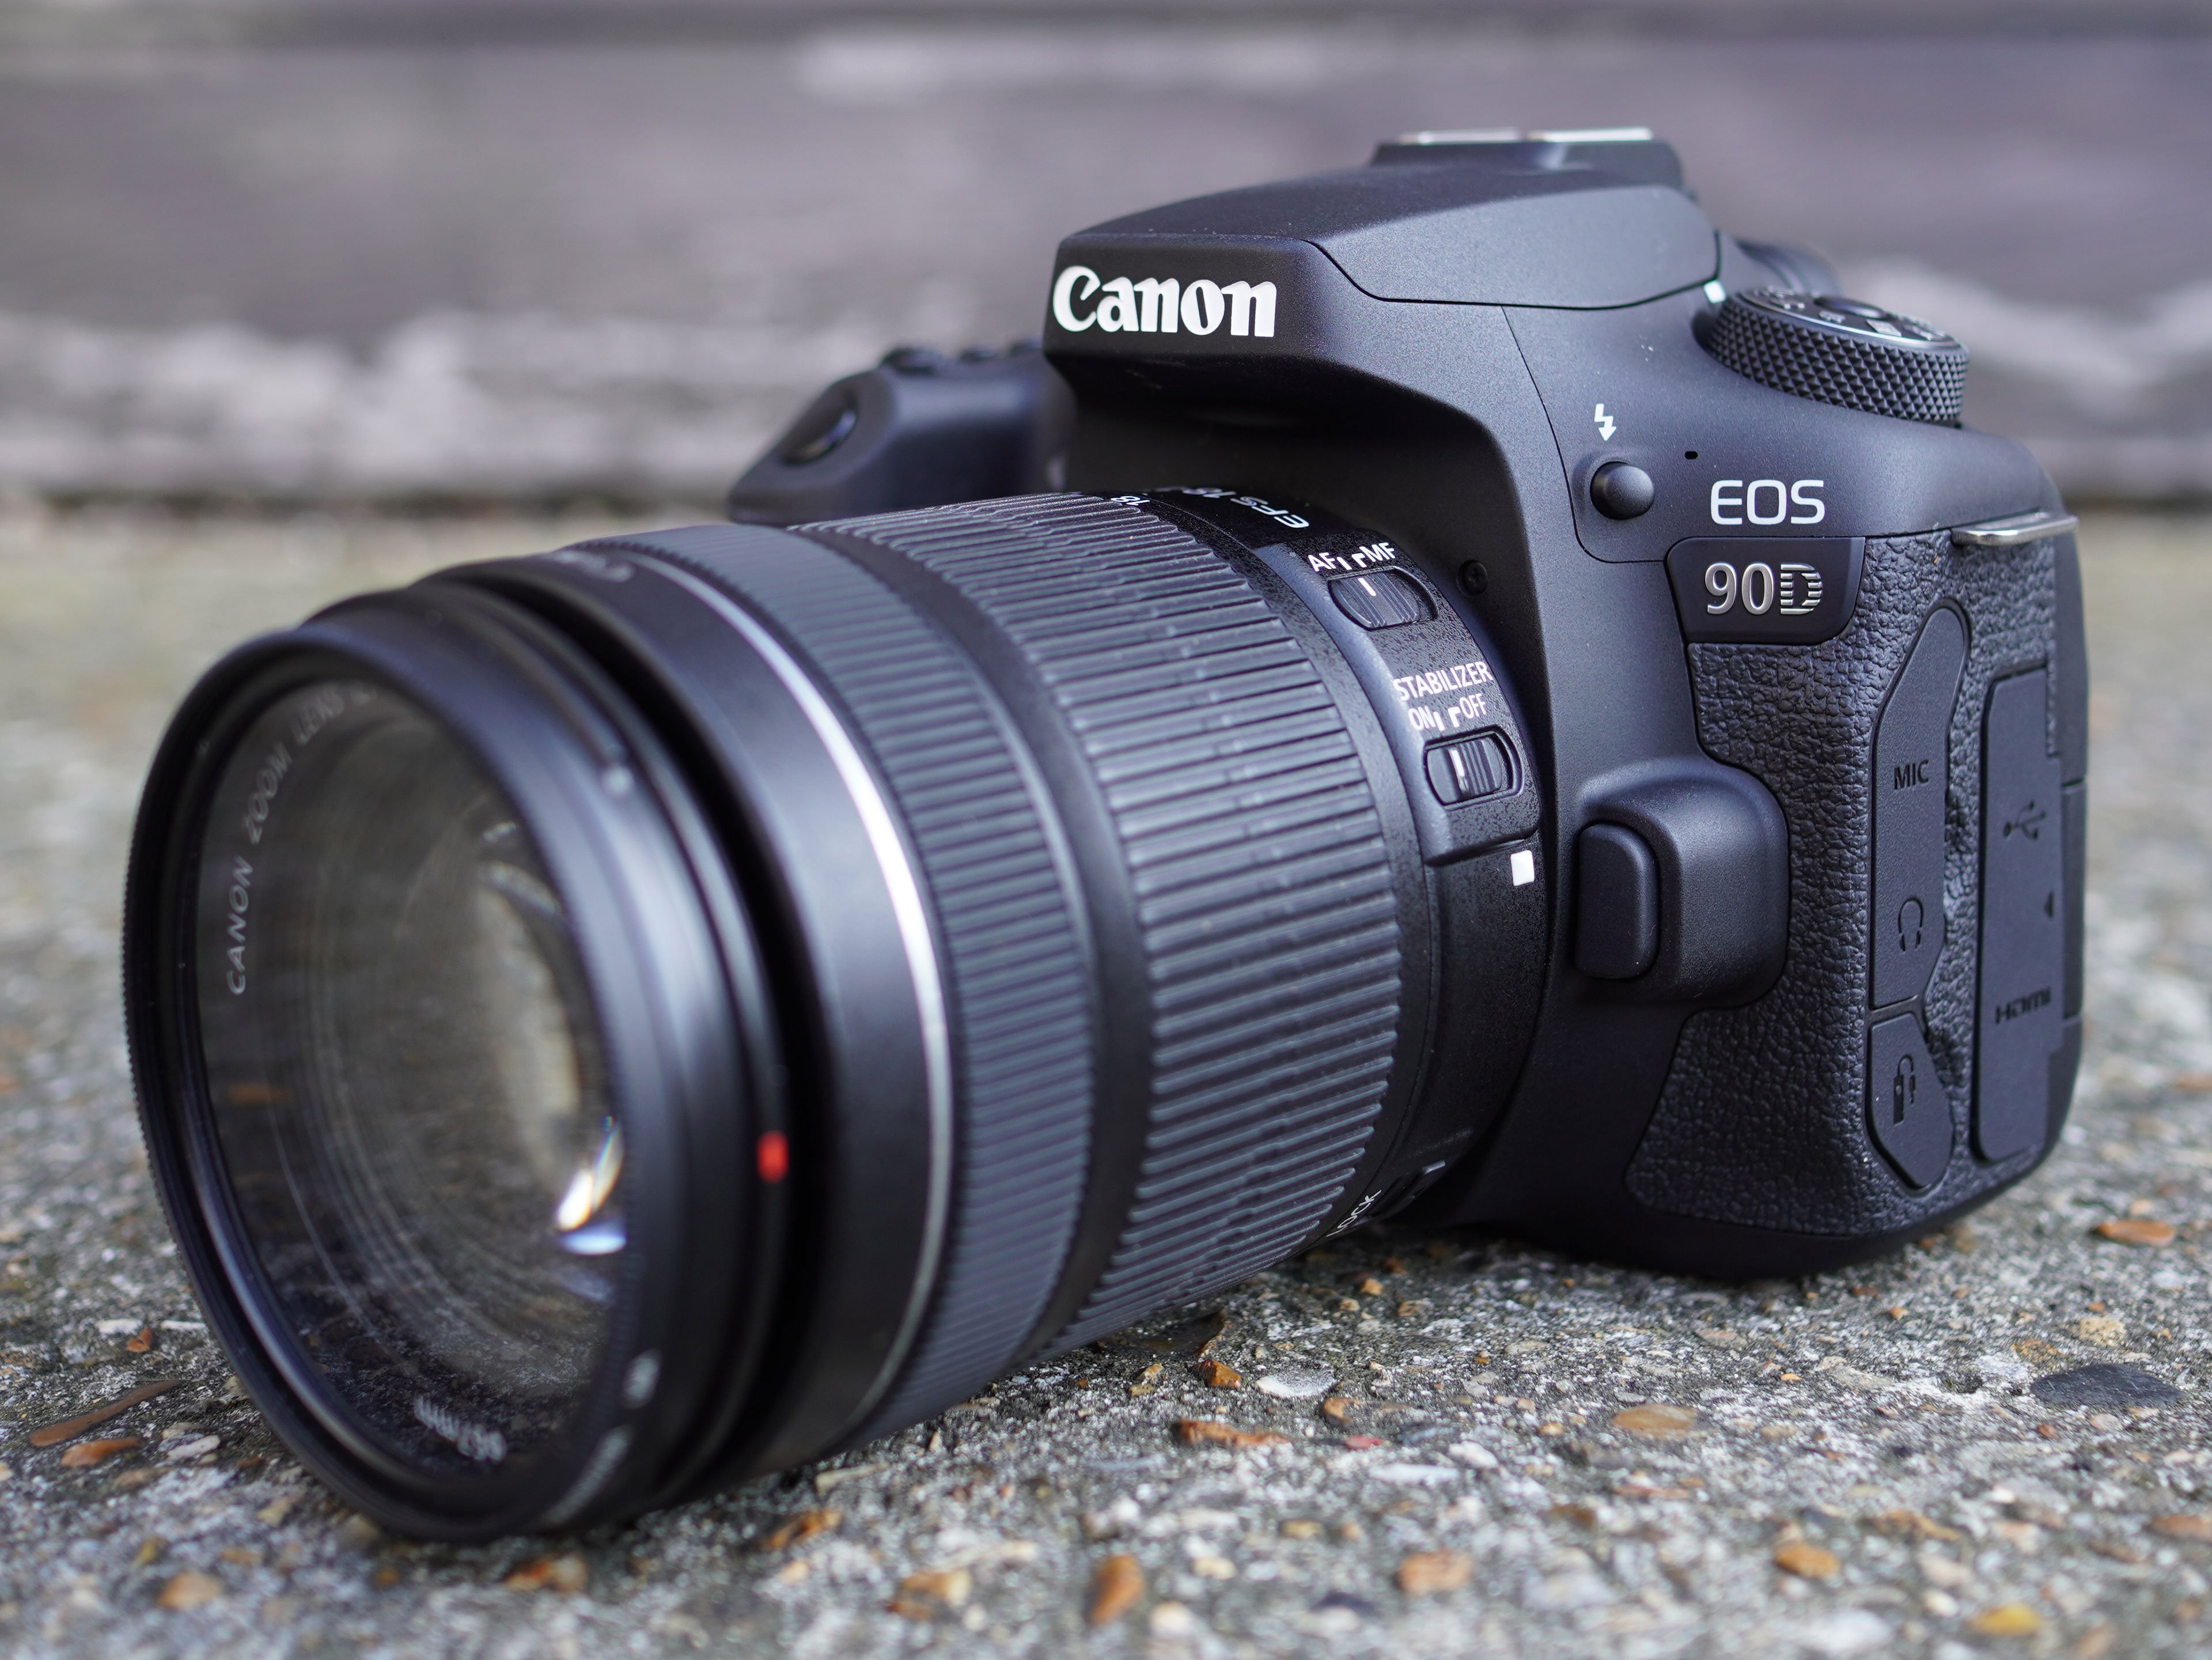 www.cameralabs.com